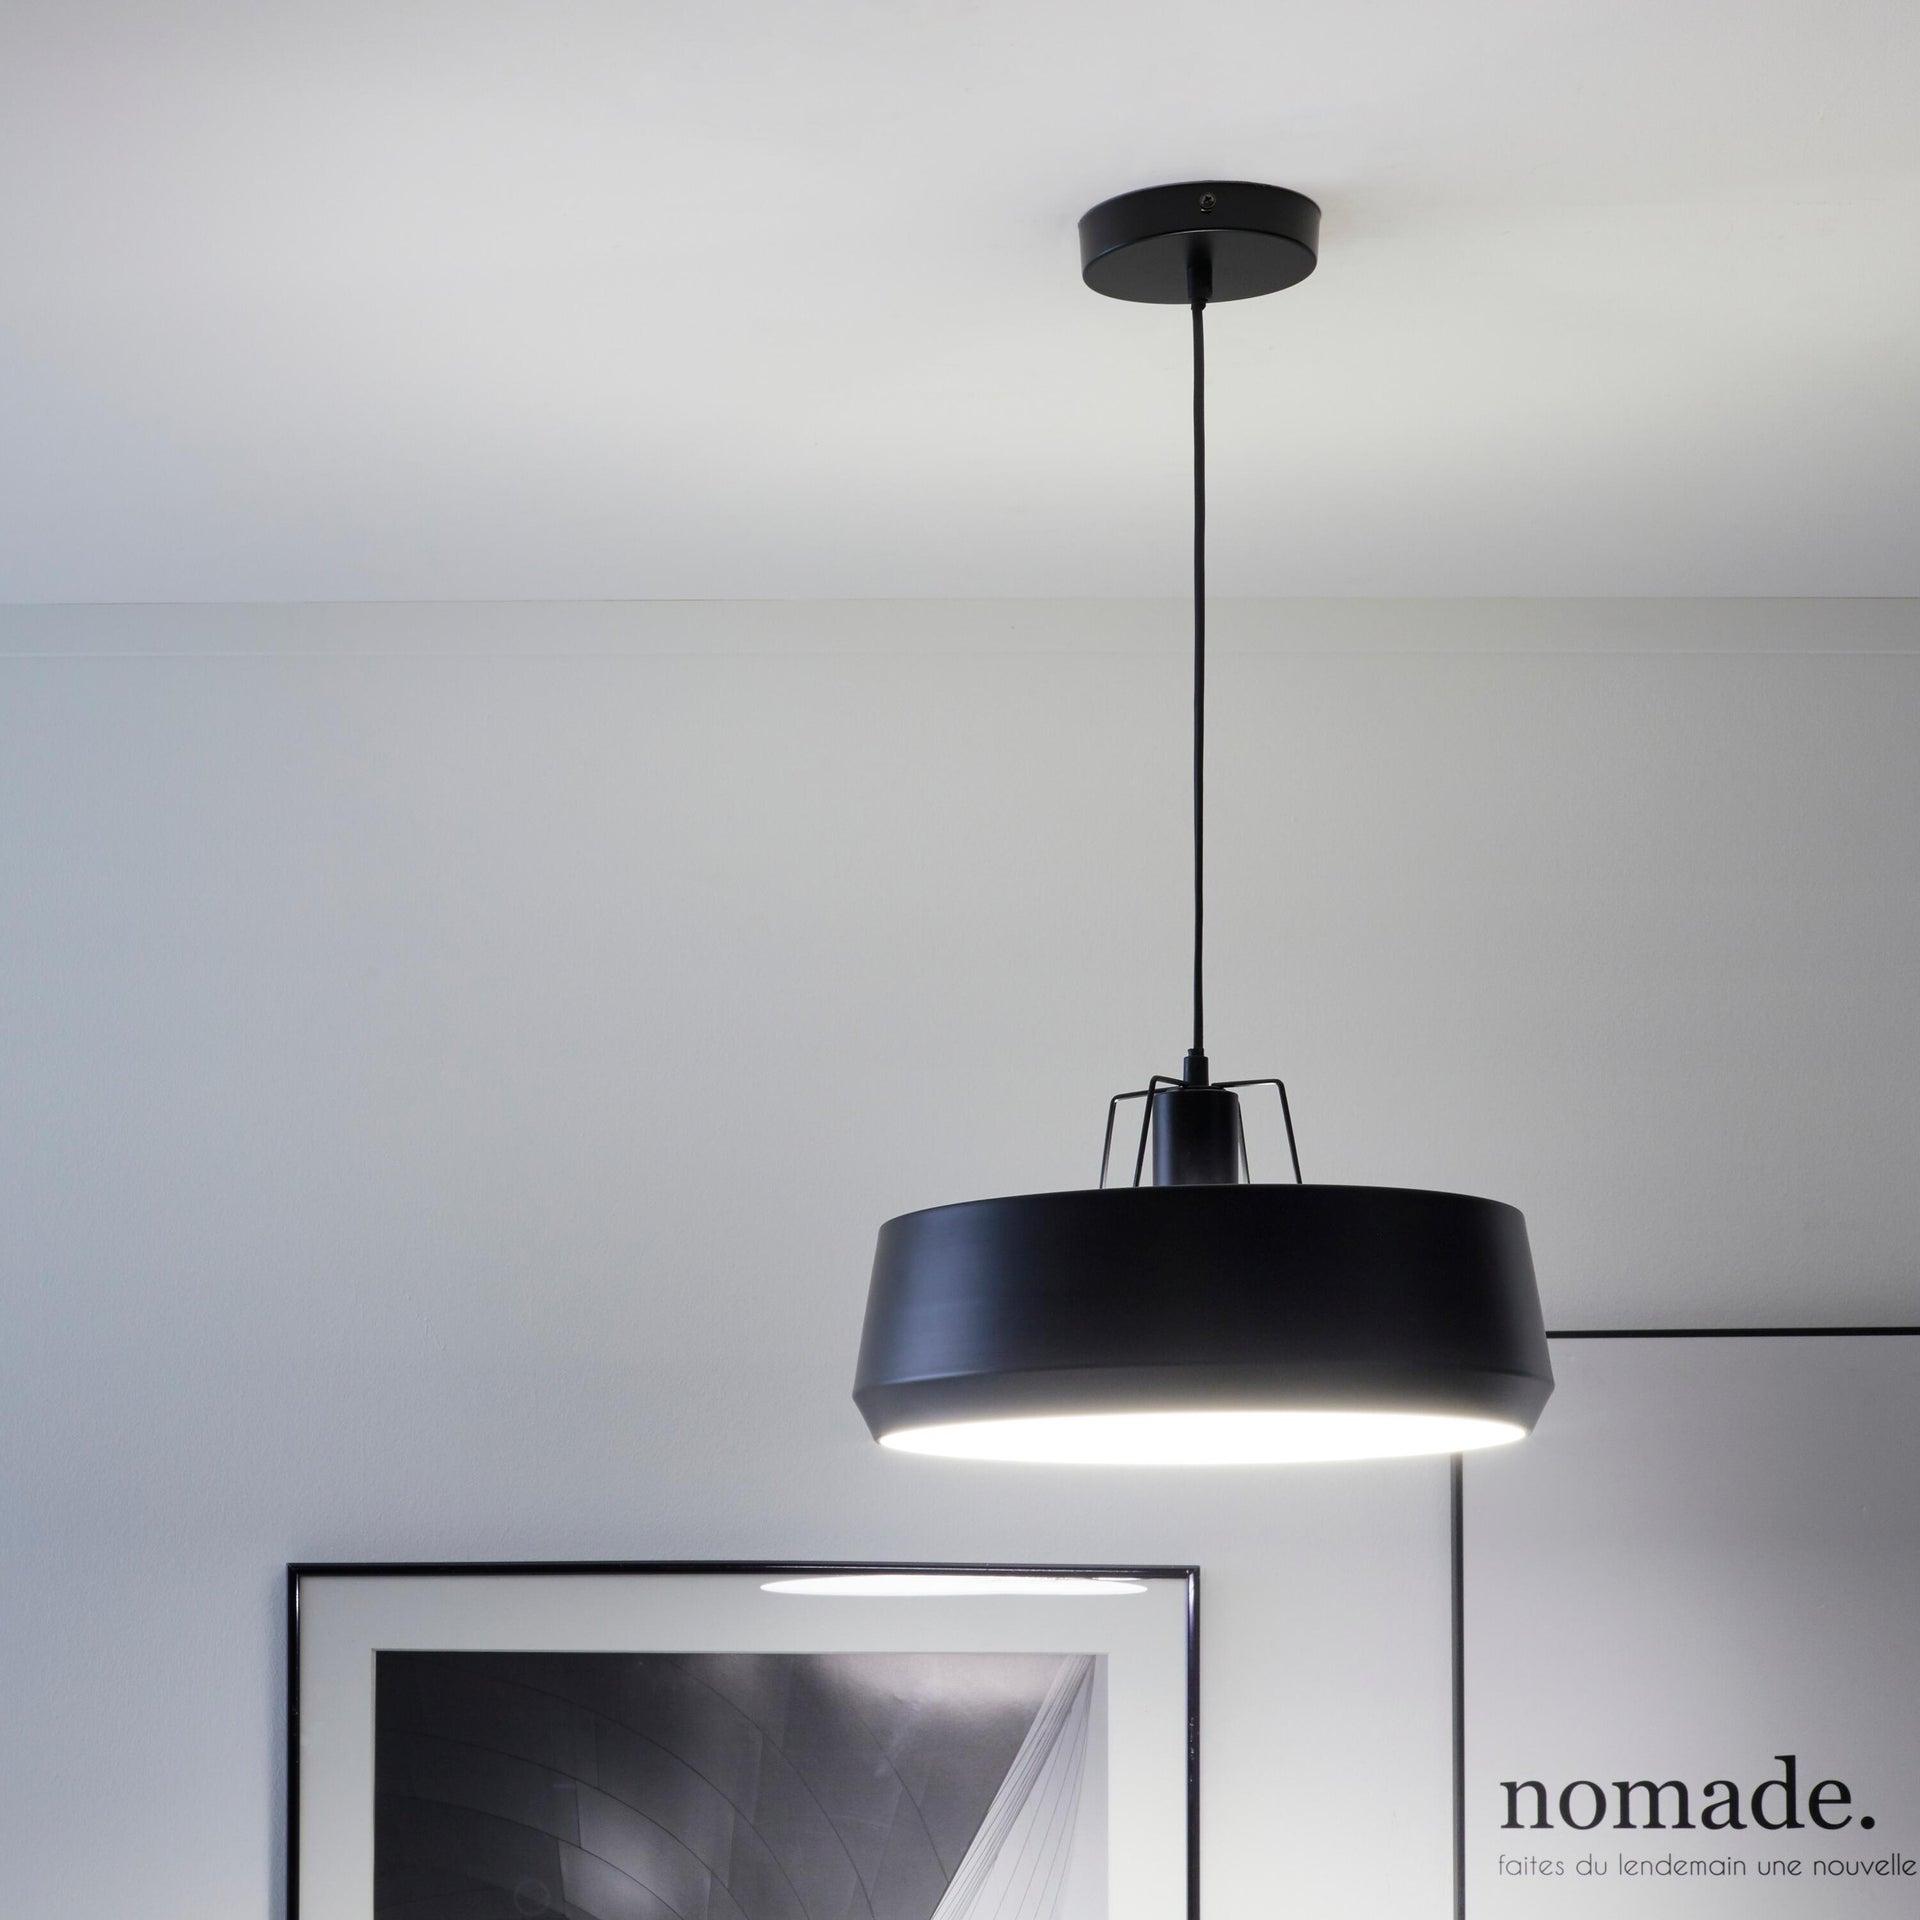 Lampadario Industriale Glint nero in metallo, D. 35 cm, L. 32 cm, INSPIRE - 1